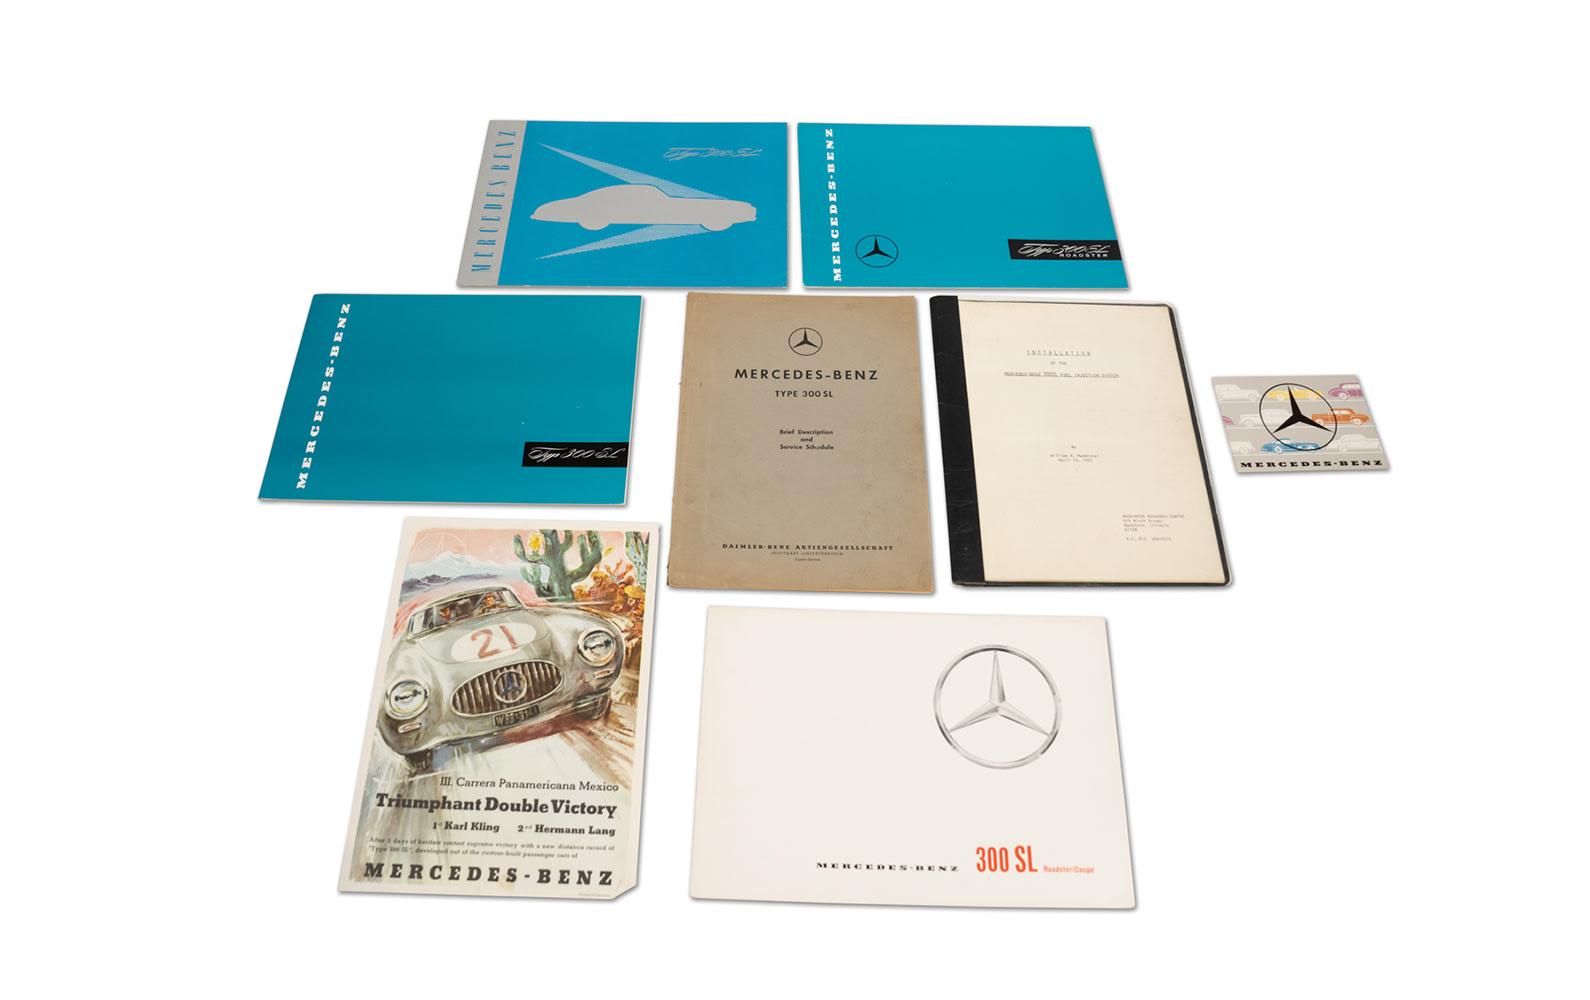 Mercedes-Benz 300 SL Gullwing and Roadster Literature